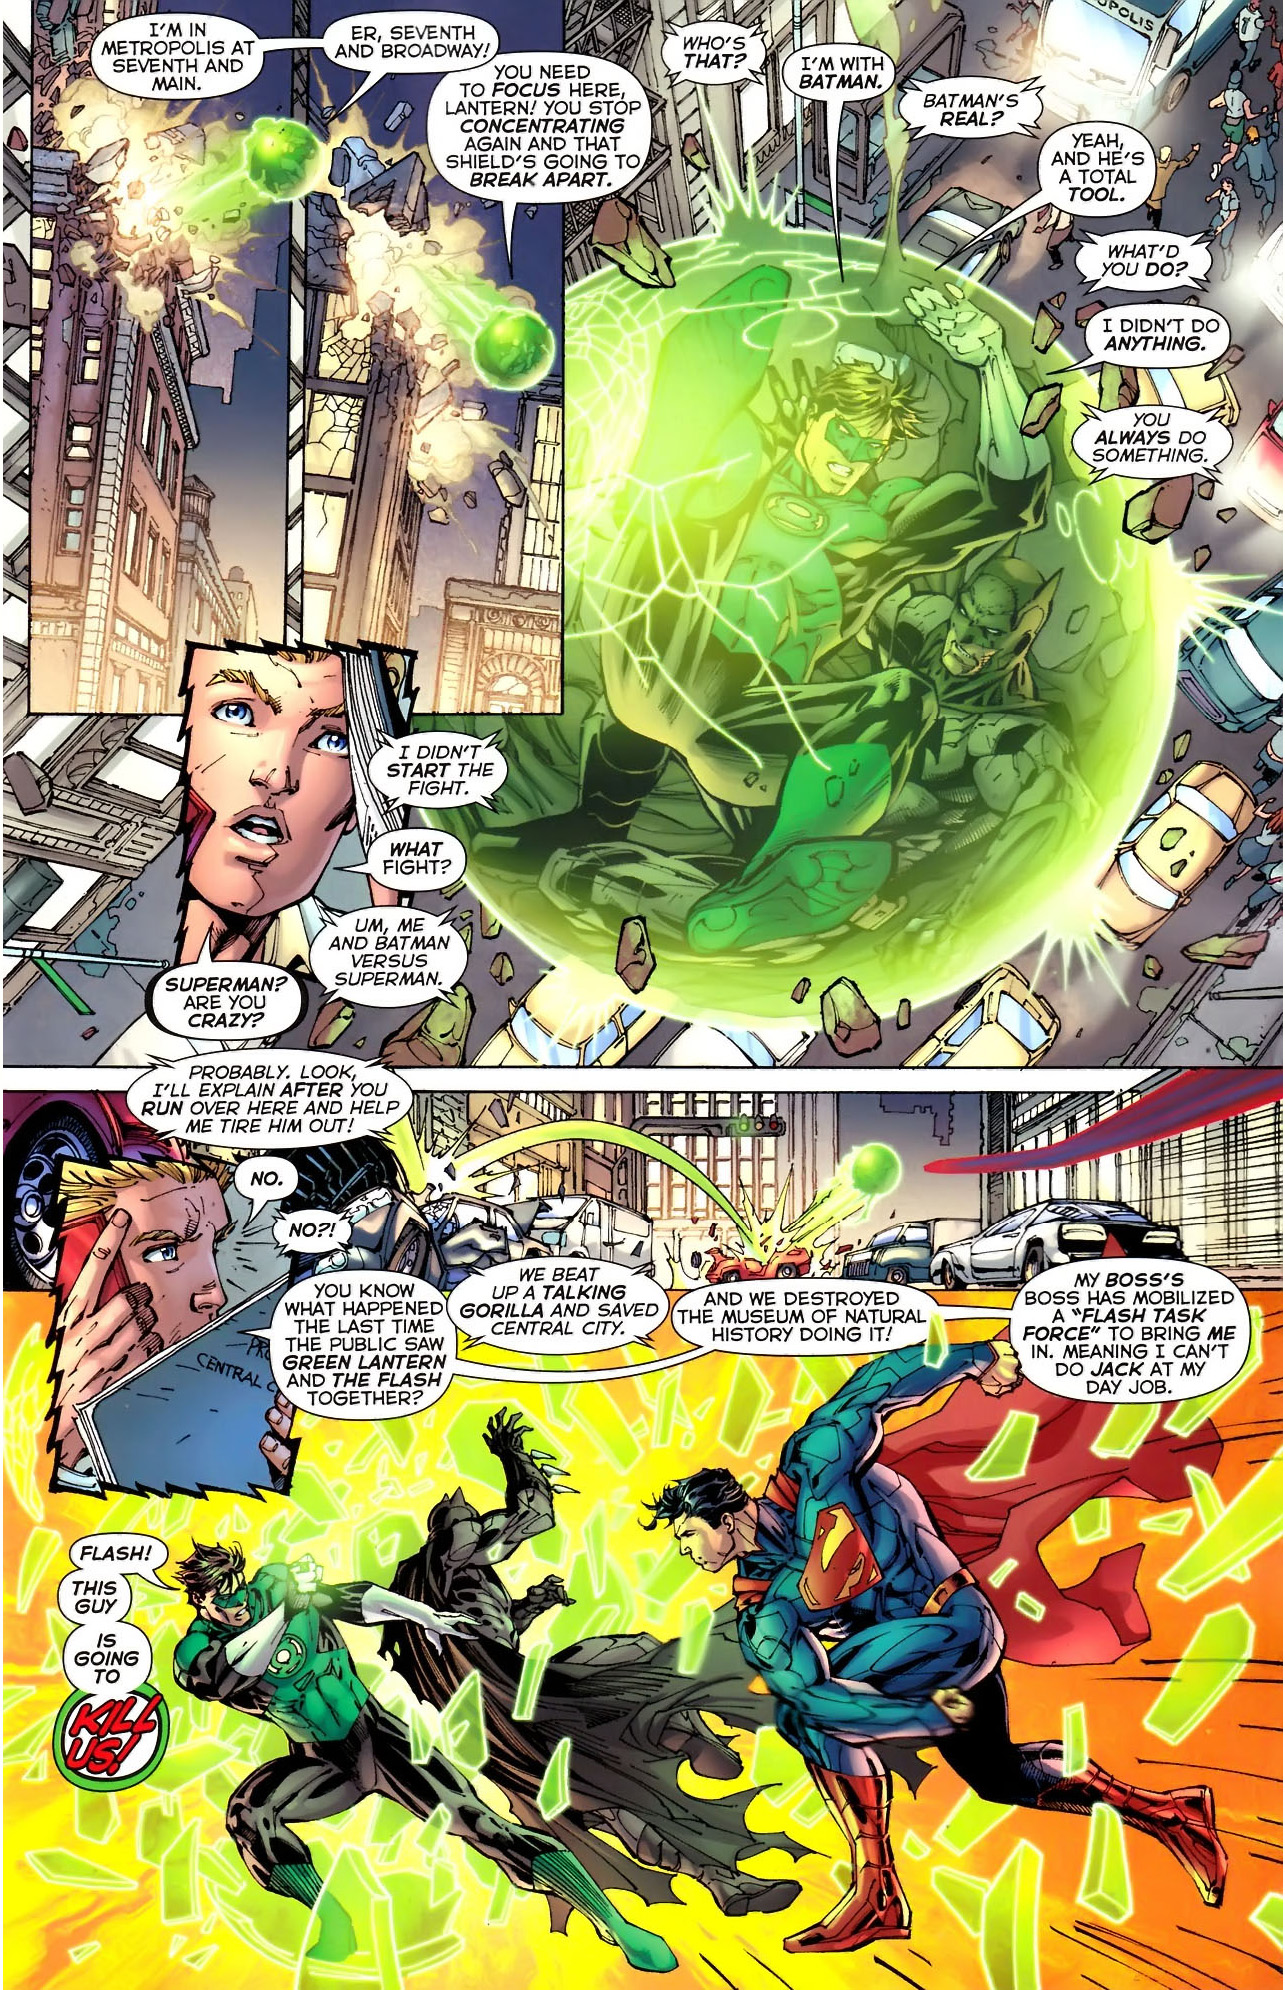 Superman vs green lantern - photo#25